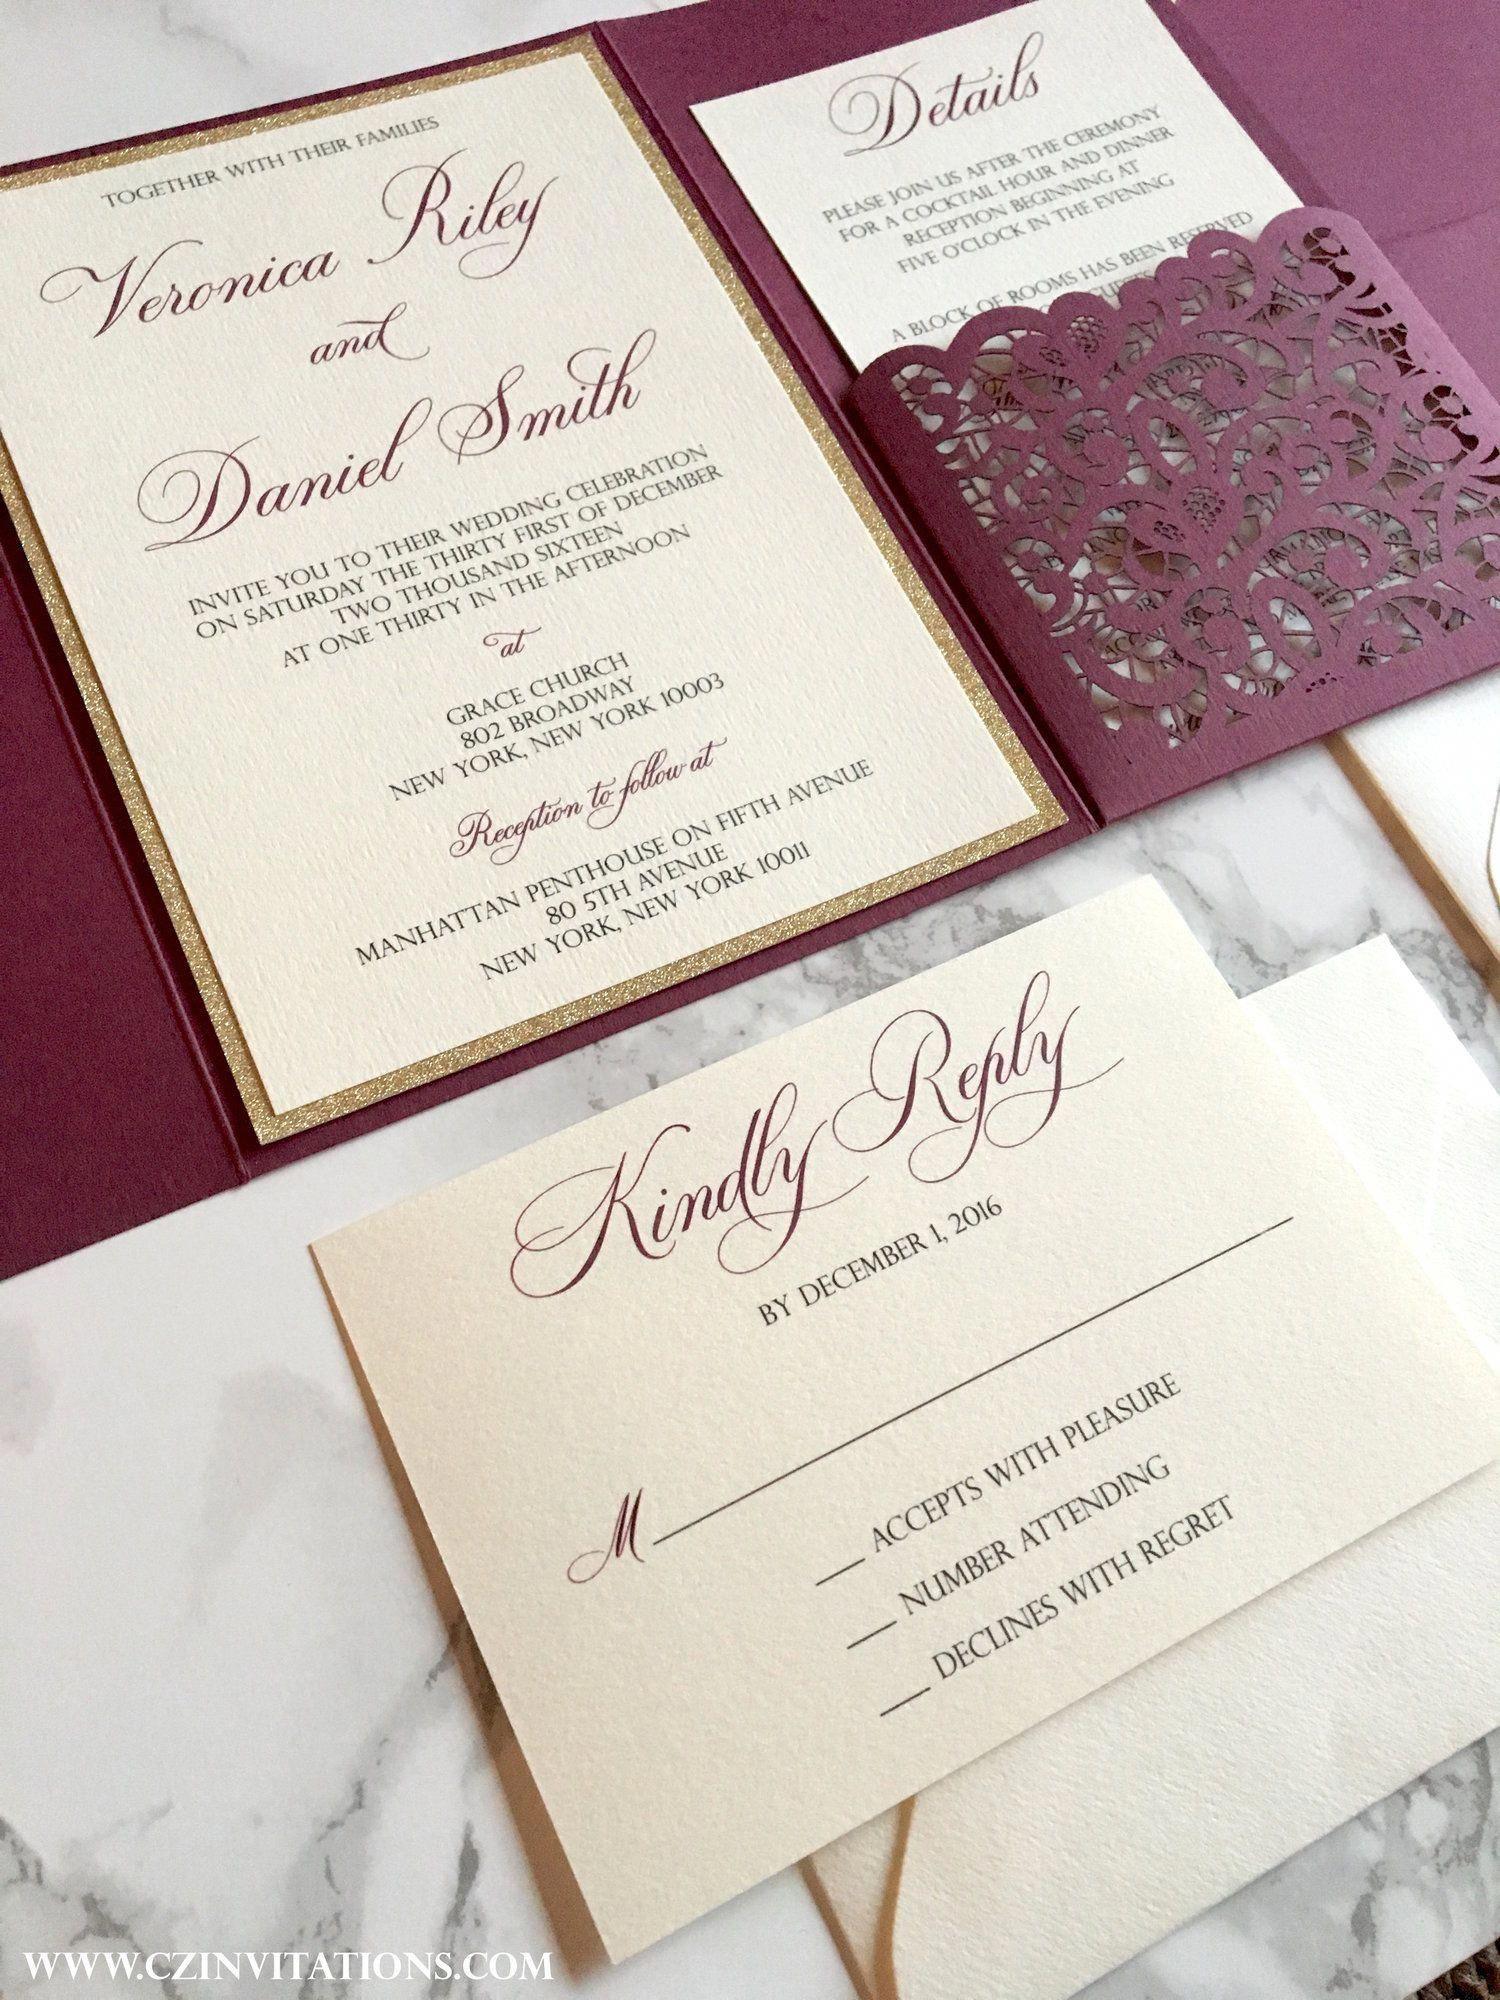 Omg I like these wedding invitations.. weddinginvitations